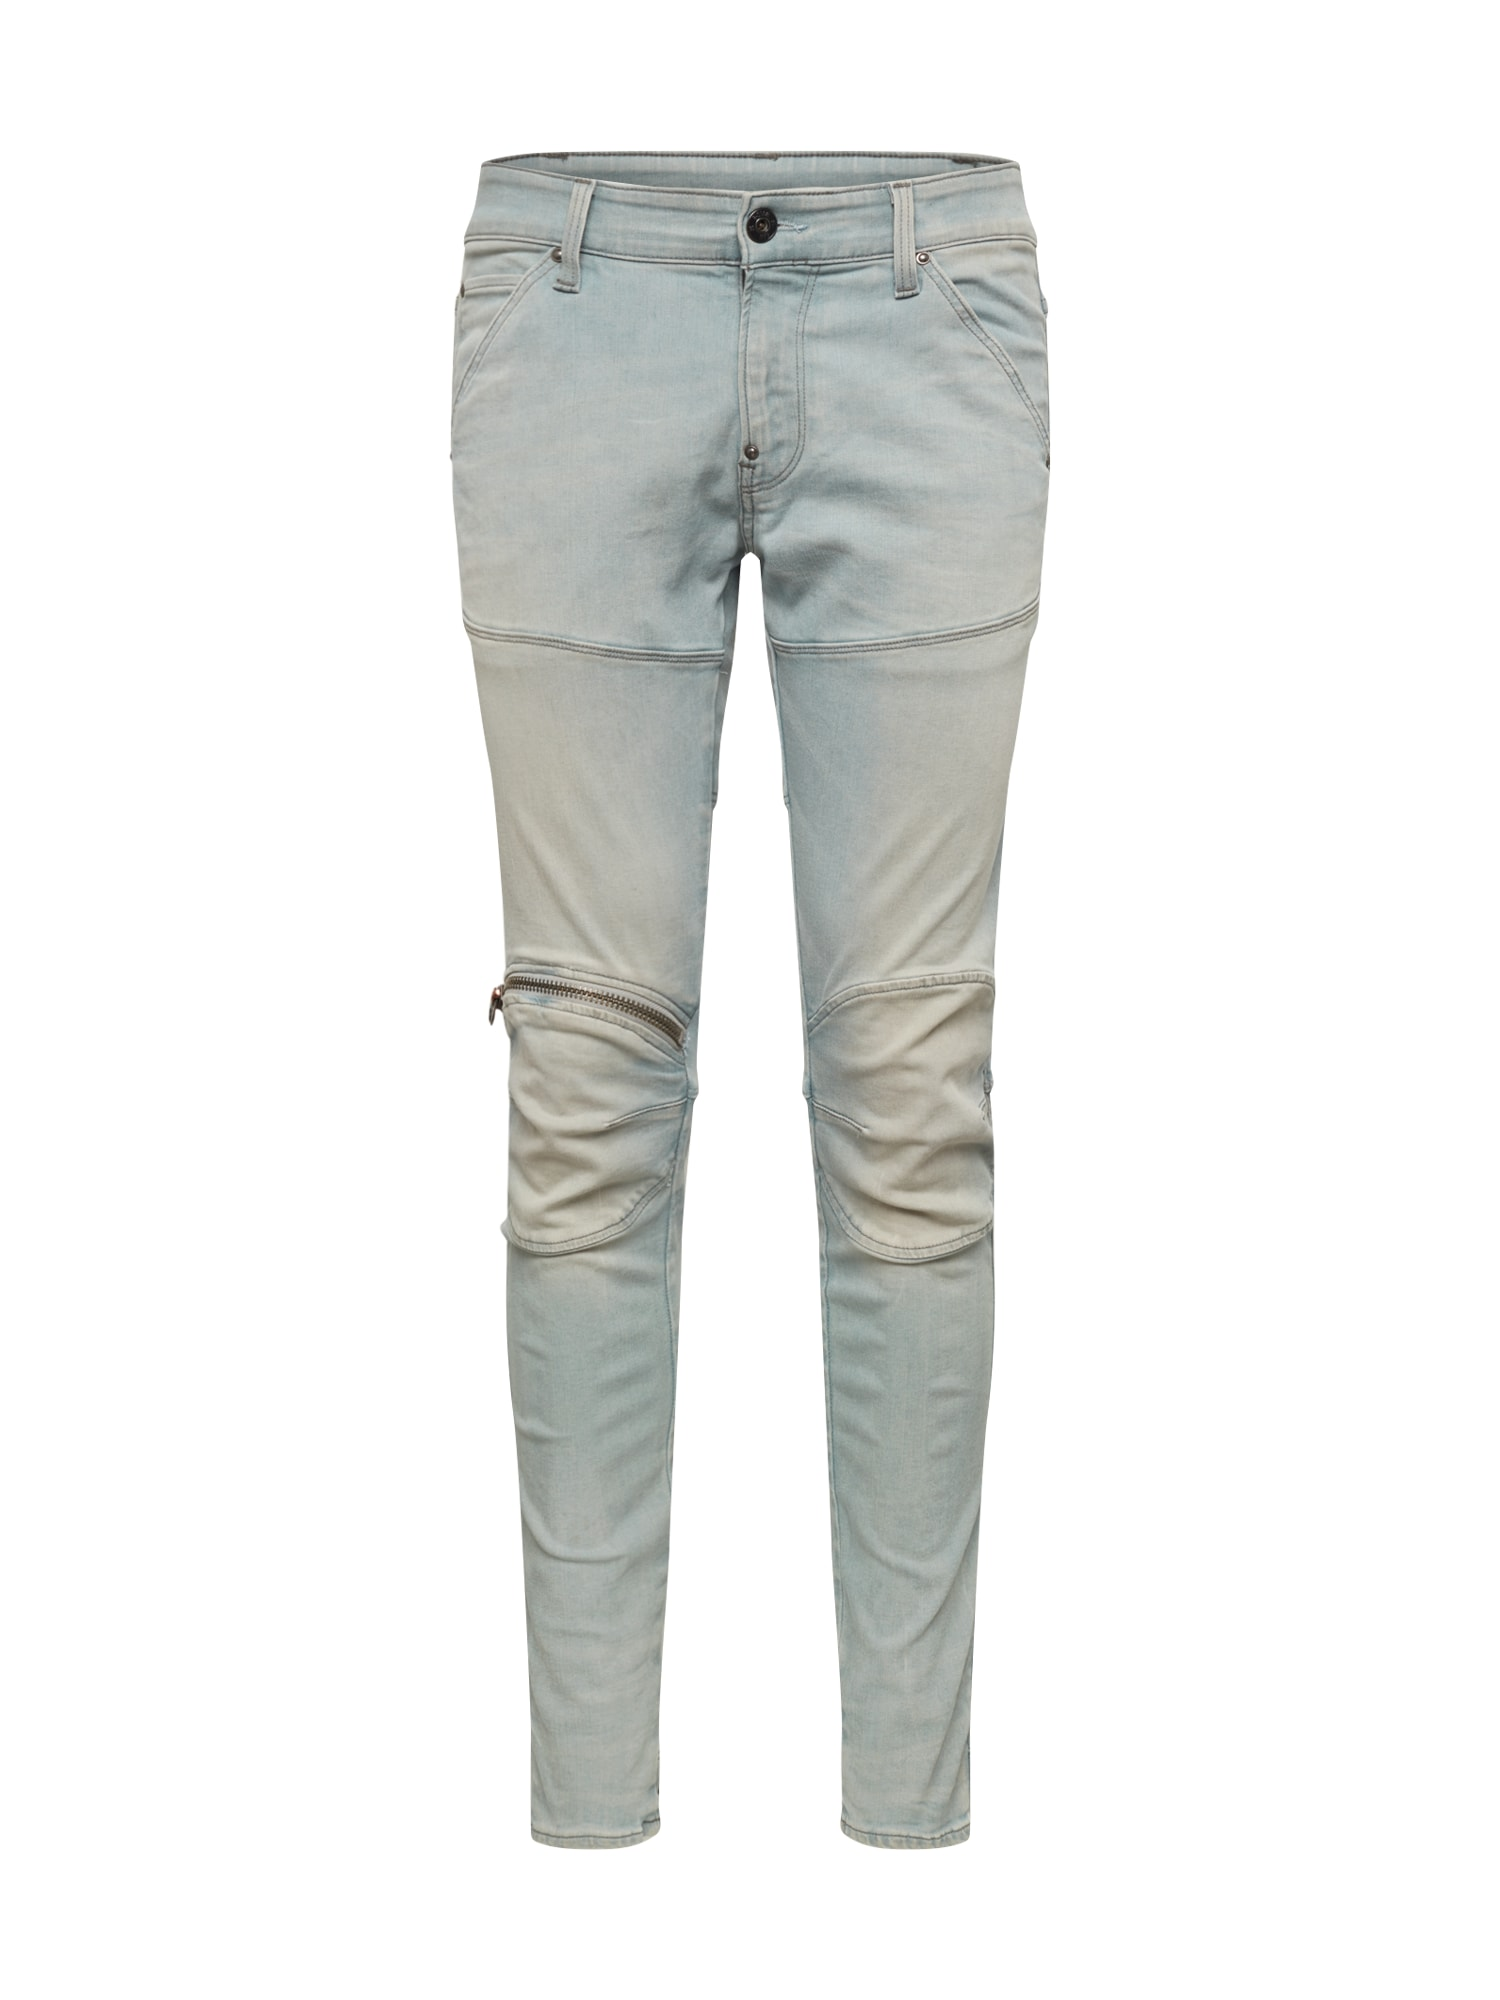 G-Star RAW Džinsai '5620 3D Zip Knee Super Slim' šviesiai mėlyna / tamsiai (džinso) mėlyna